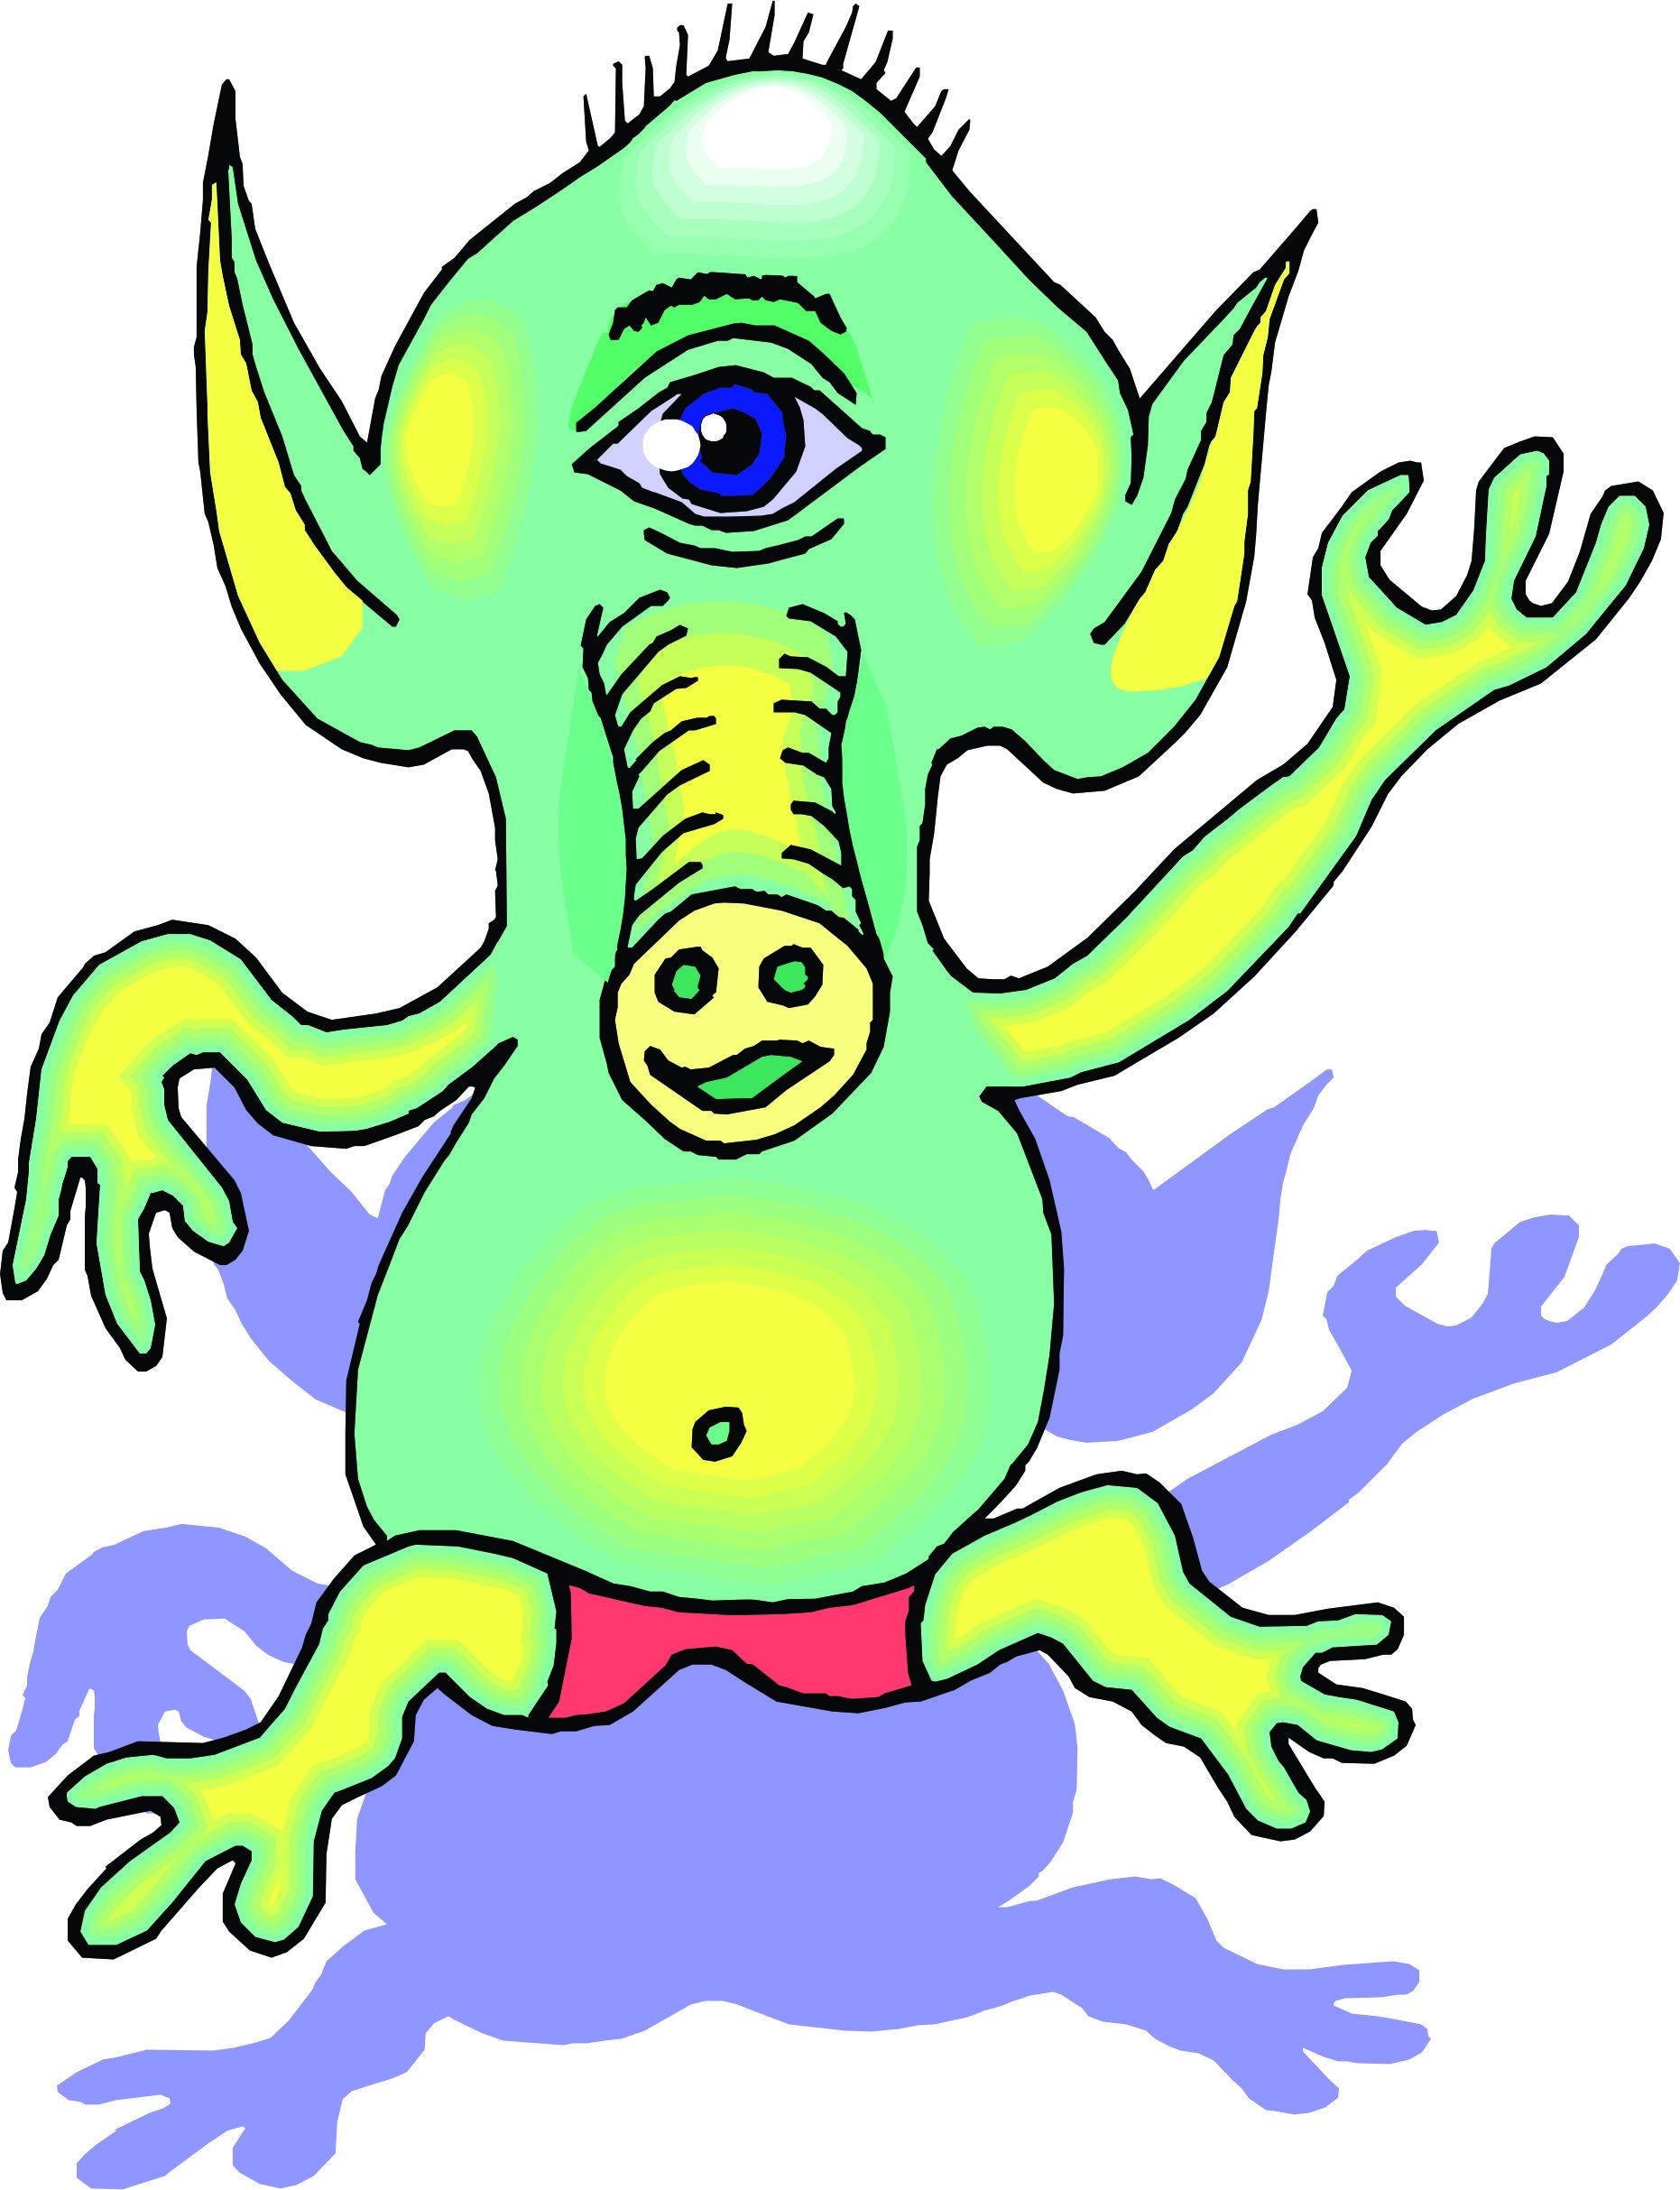 Cartoon aliens library. Alien clipart sick